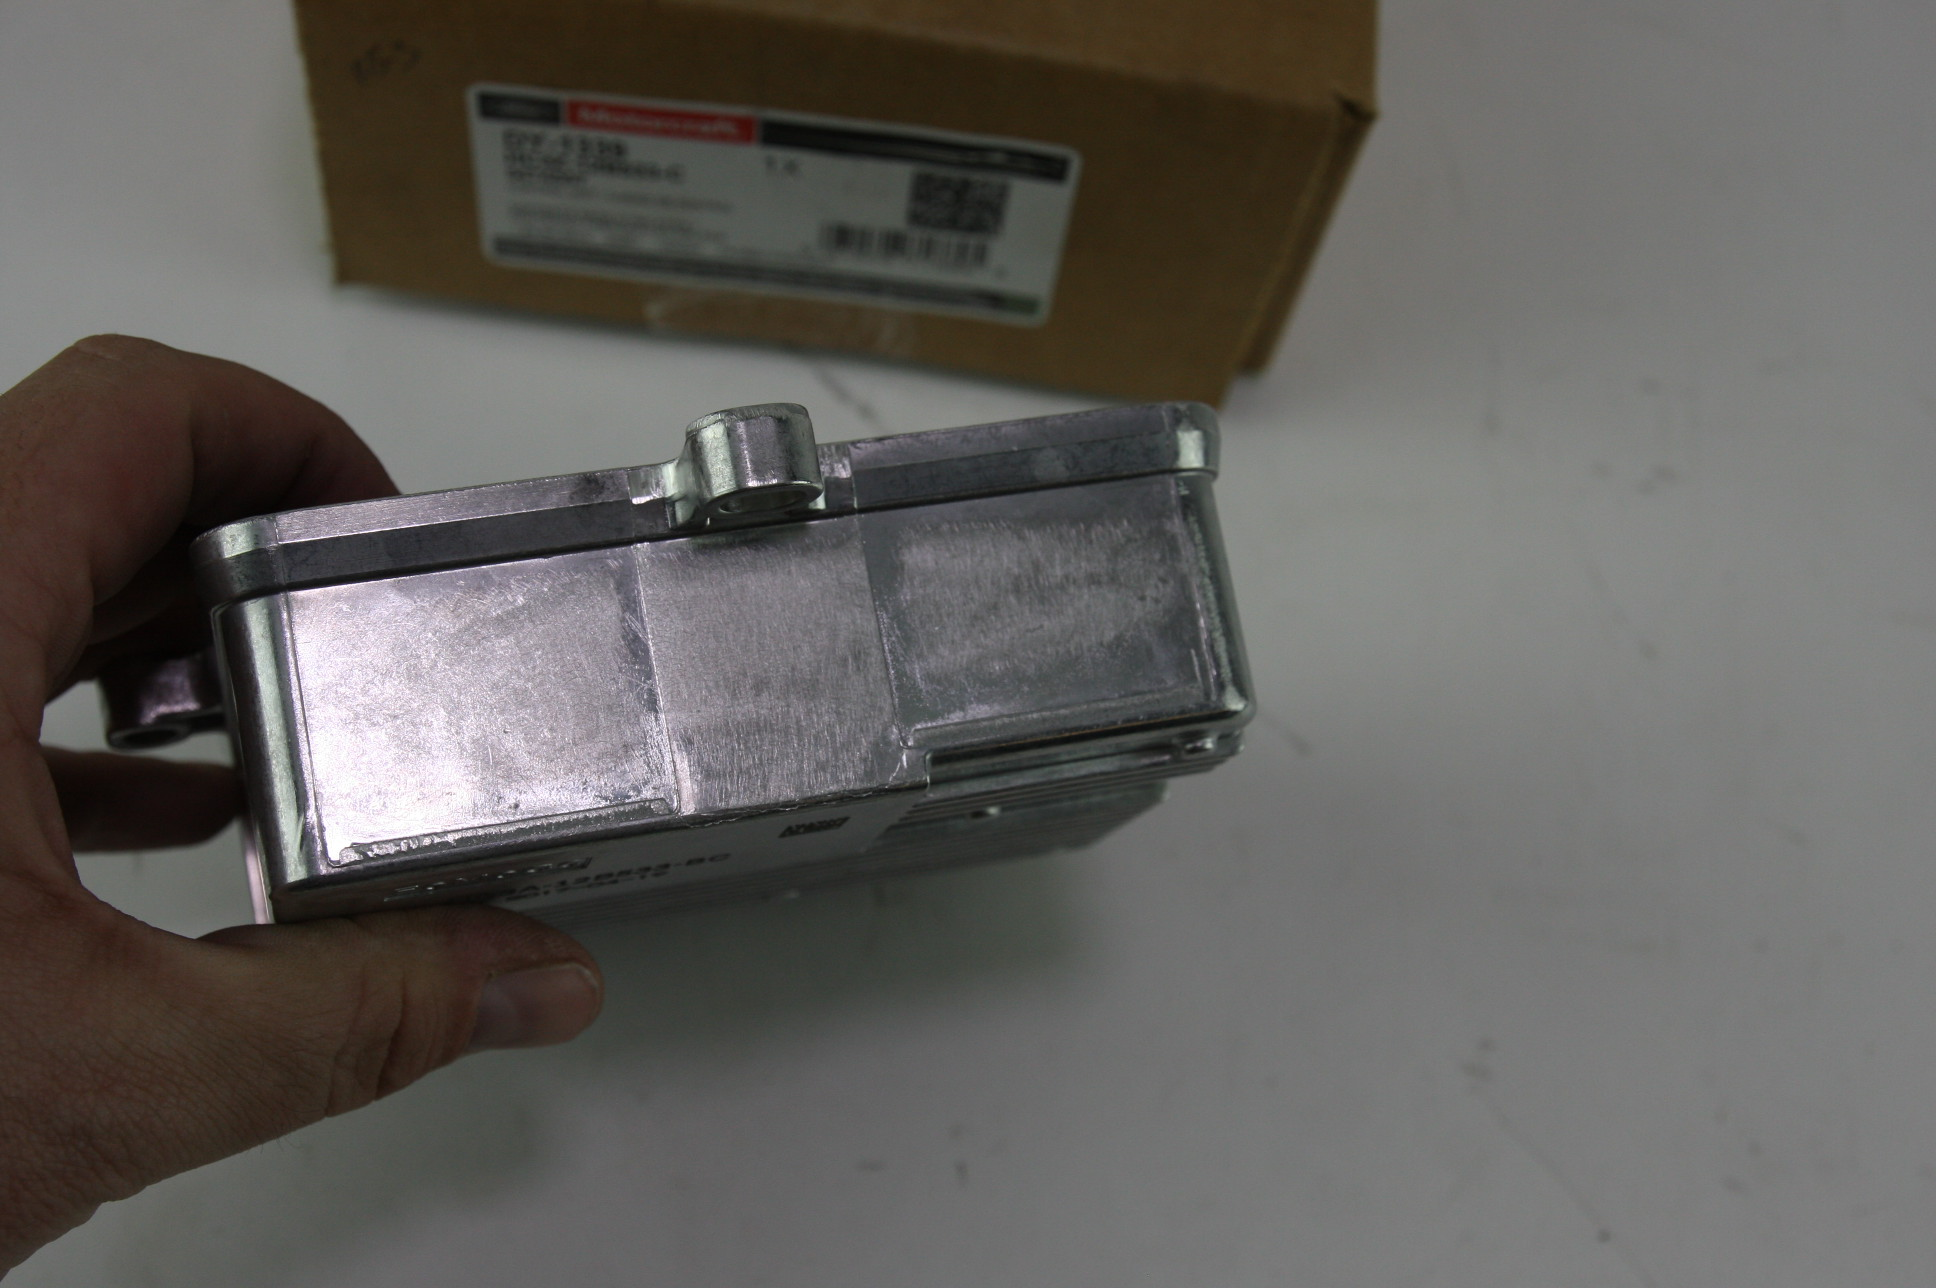 ~ New OEM Motorcraft DY1339 Ford HC3Z12B533C Glow Plug Controller - image 8